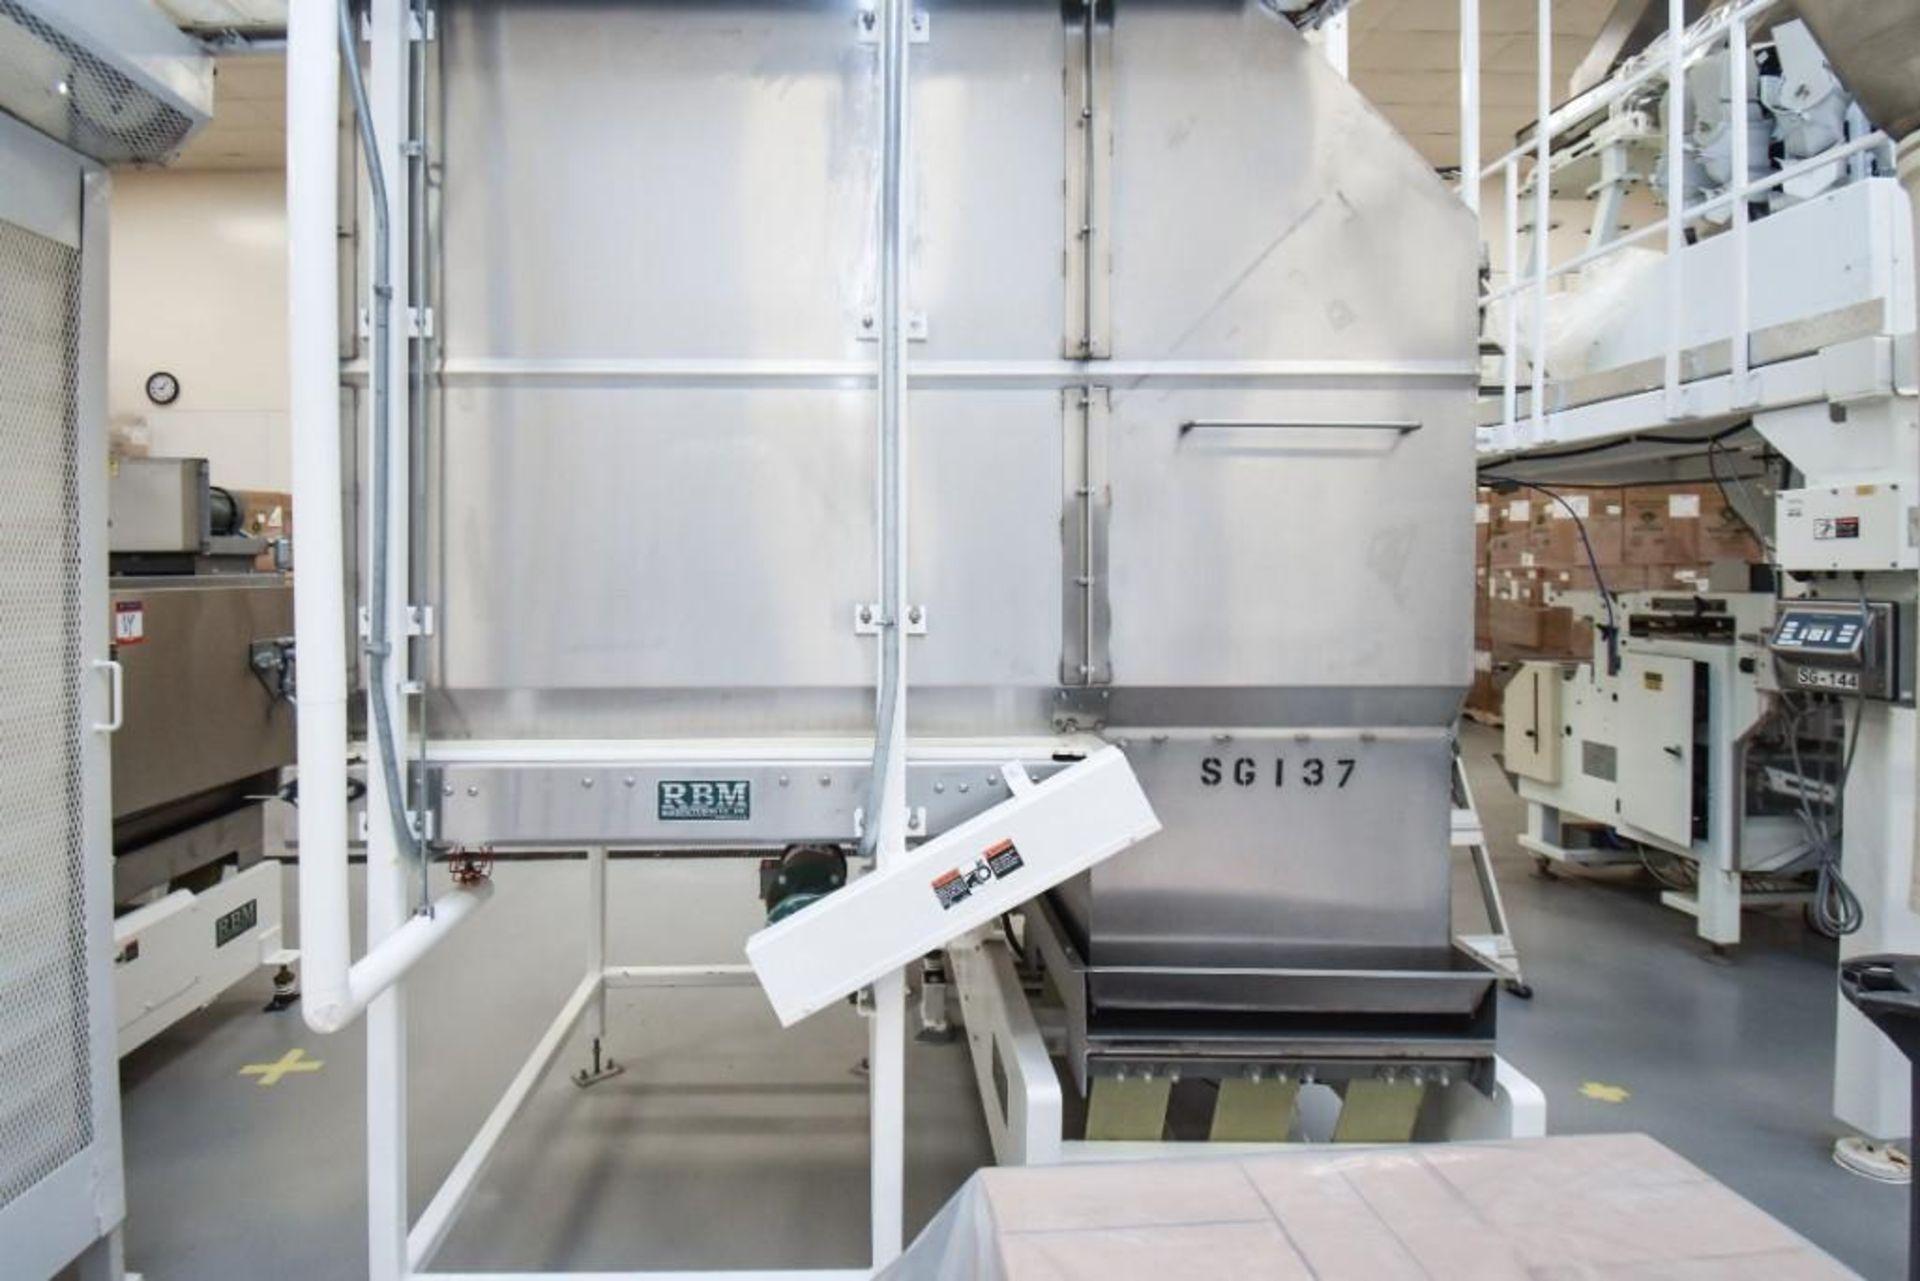 RBM Accumulation Hopper Conveyor and Vibratory Deck AC-1-4X4-6 - Image 4 of 11